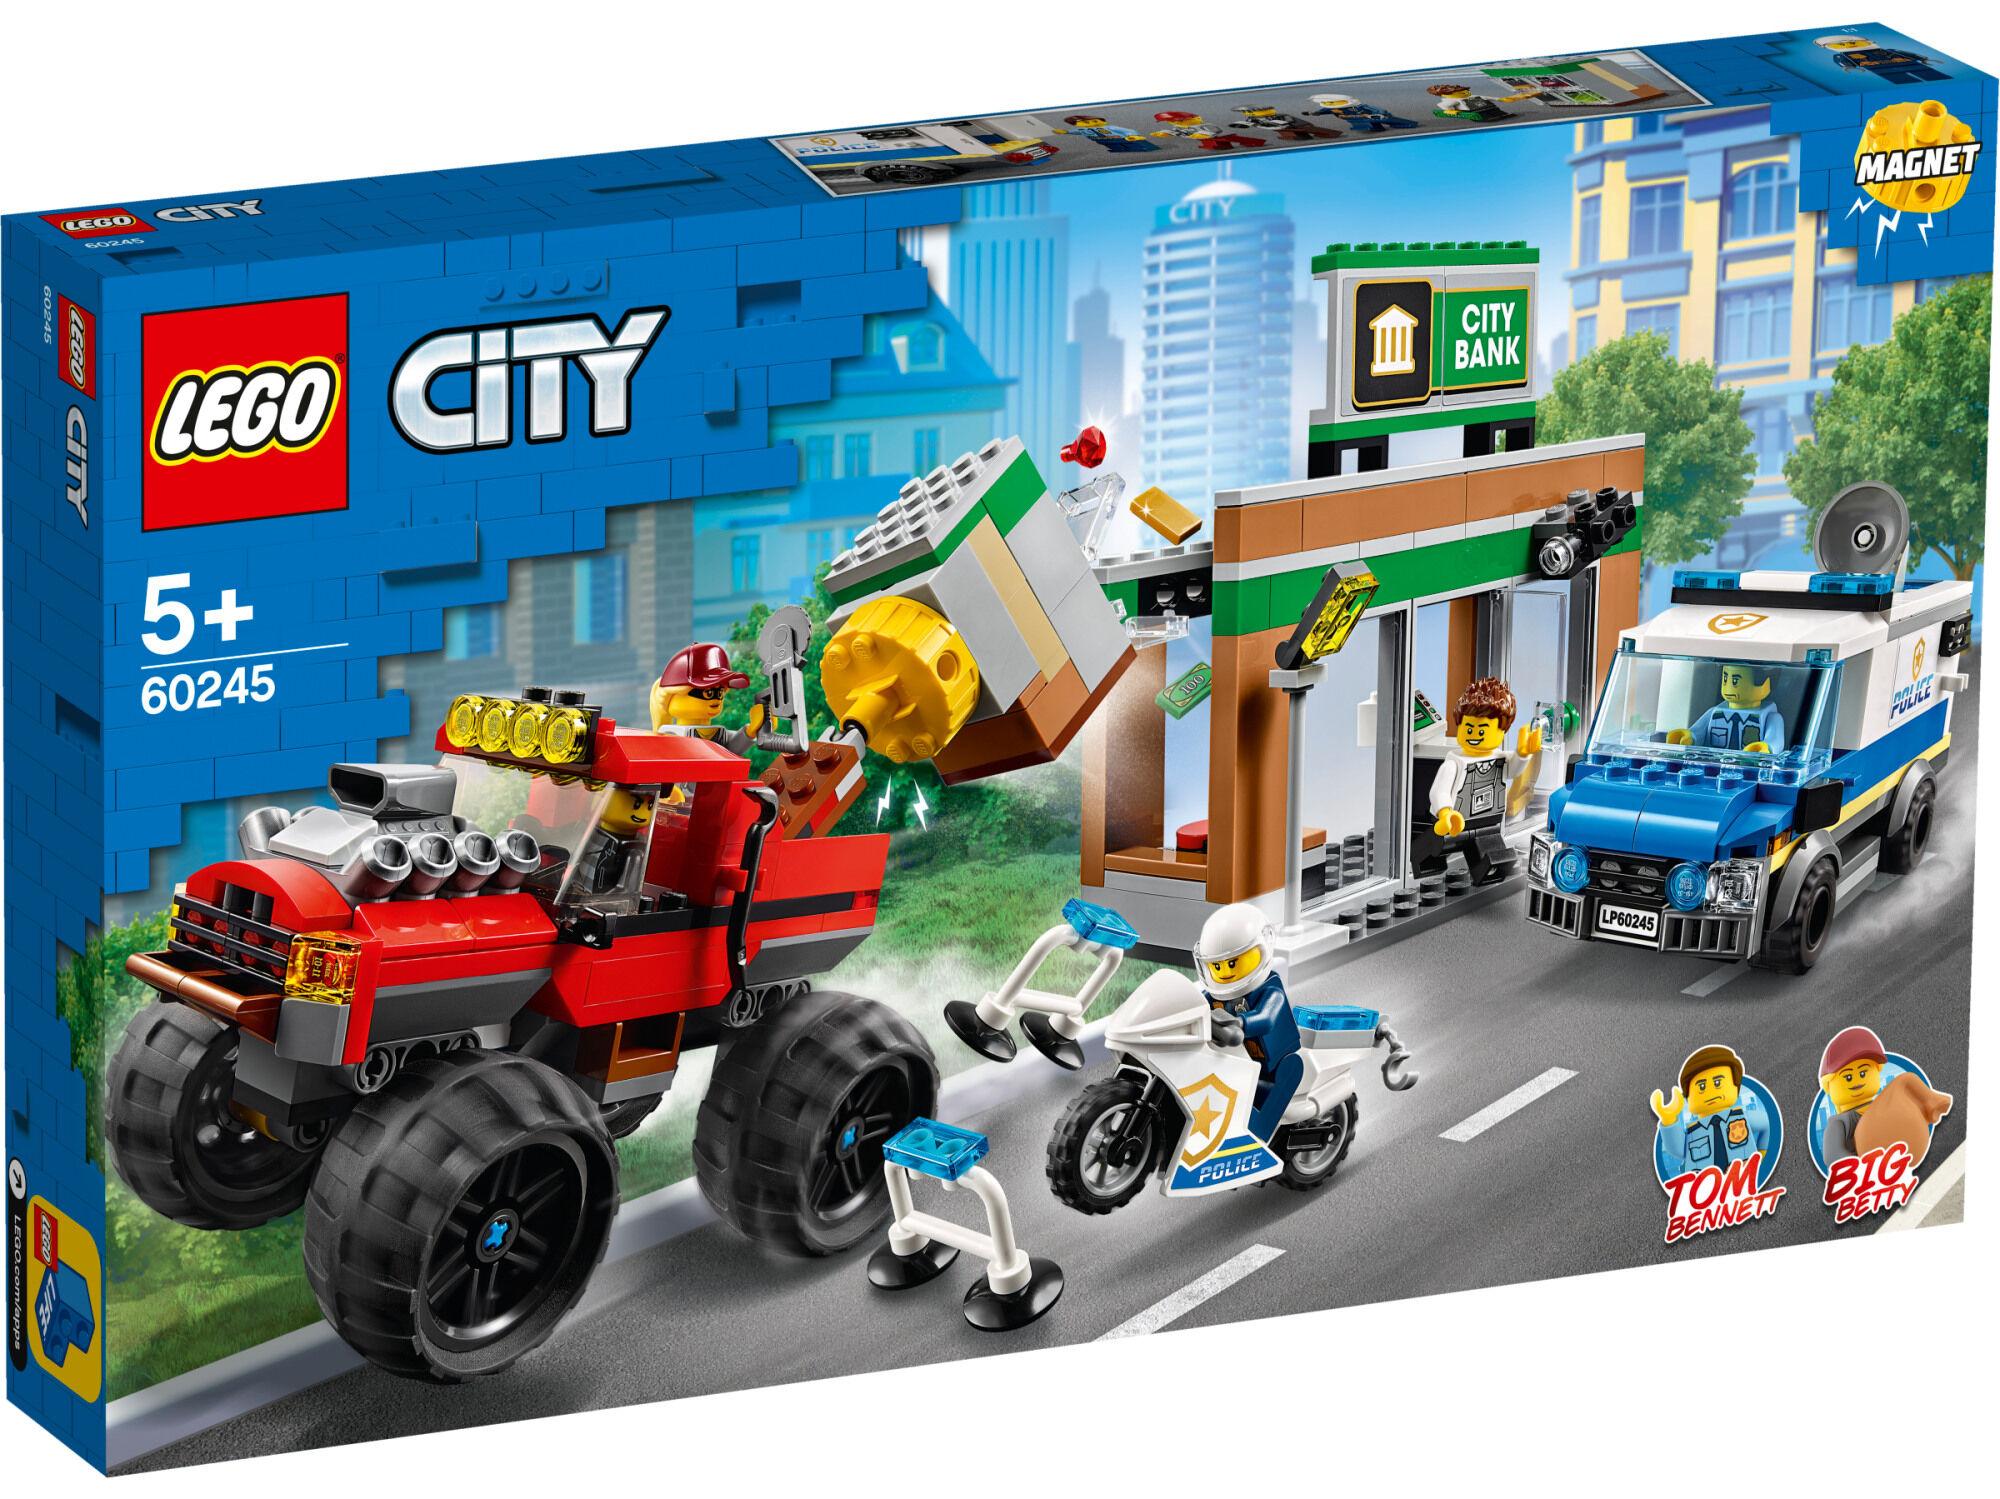 Lego City Police 60245 Ryöstö monsteriautolla